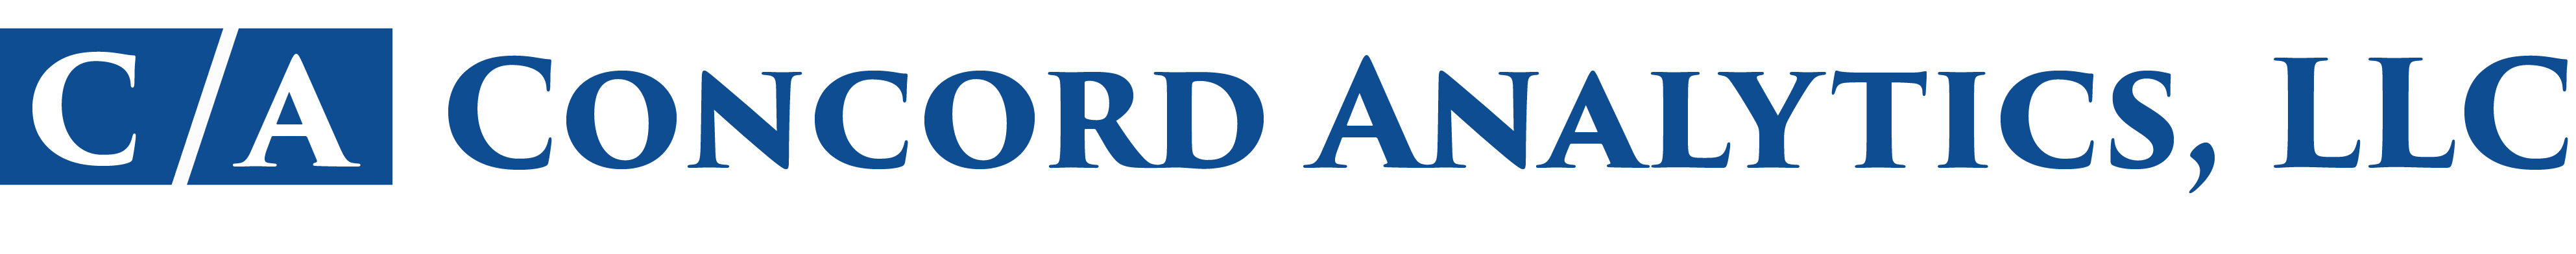 Concord Analytics, LLC